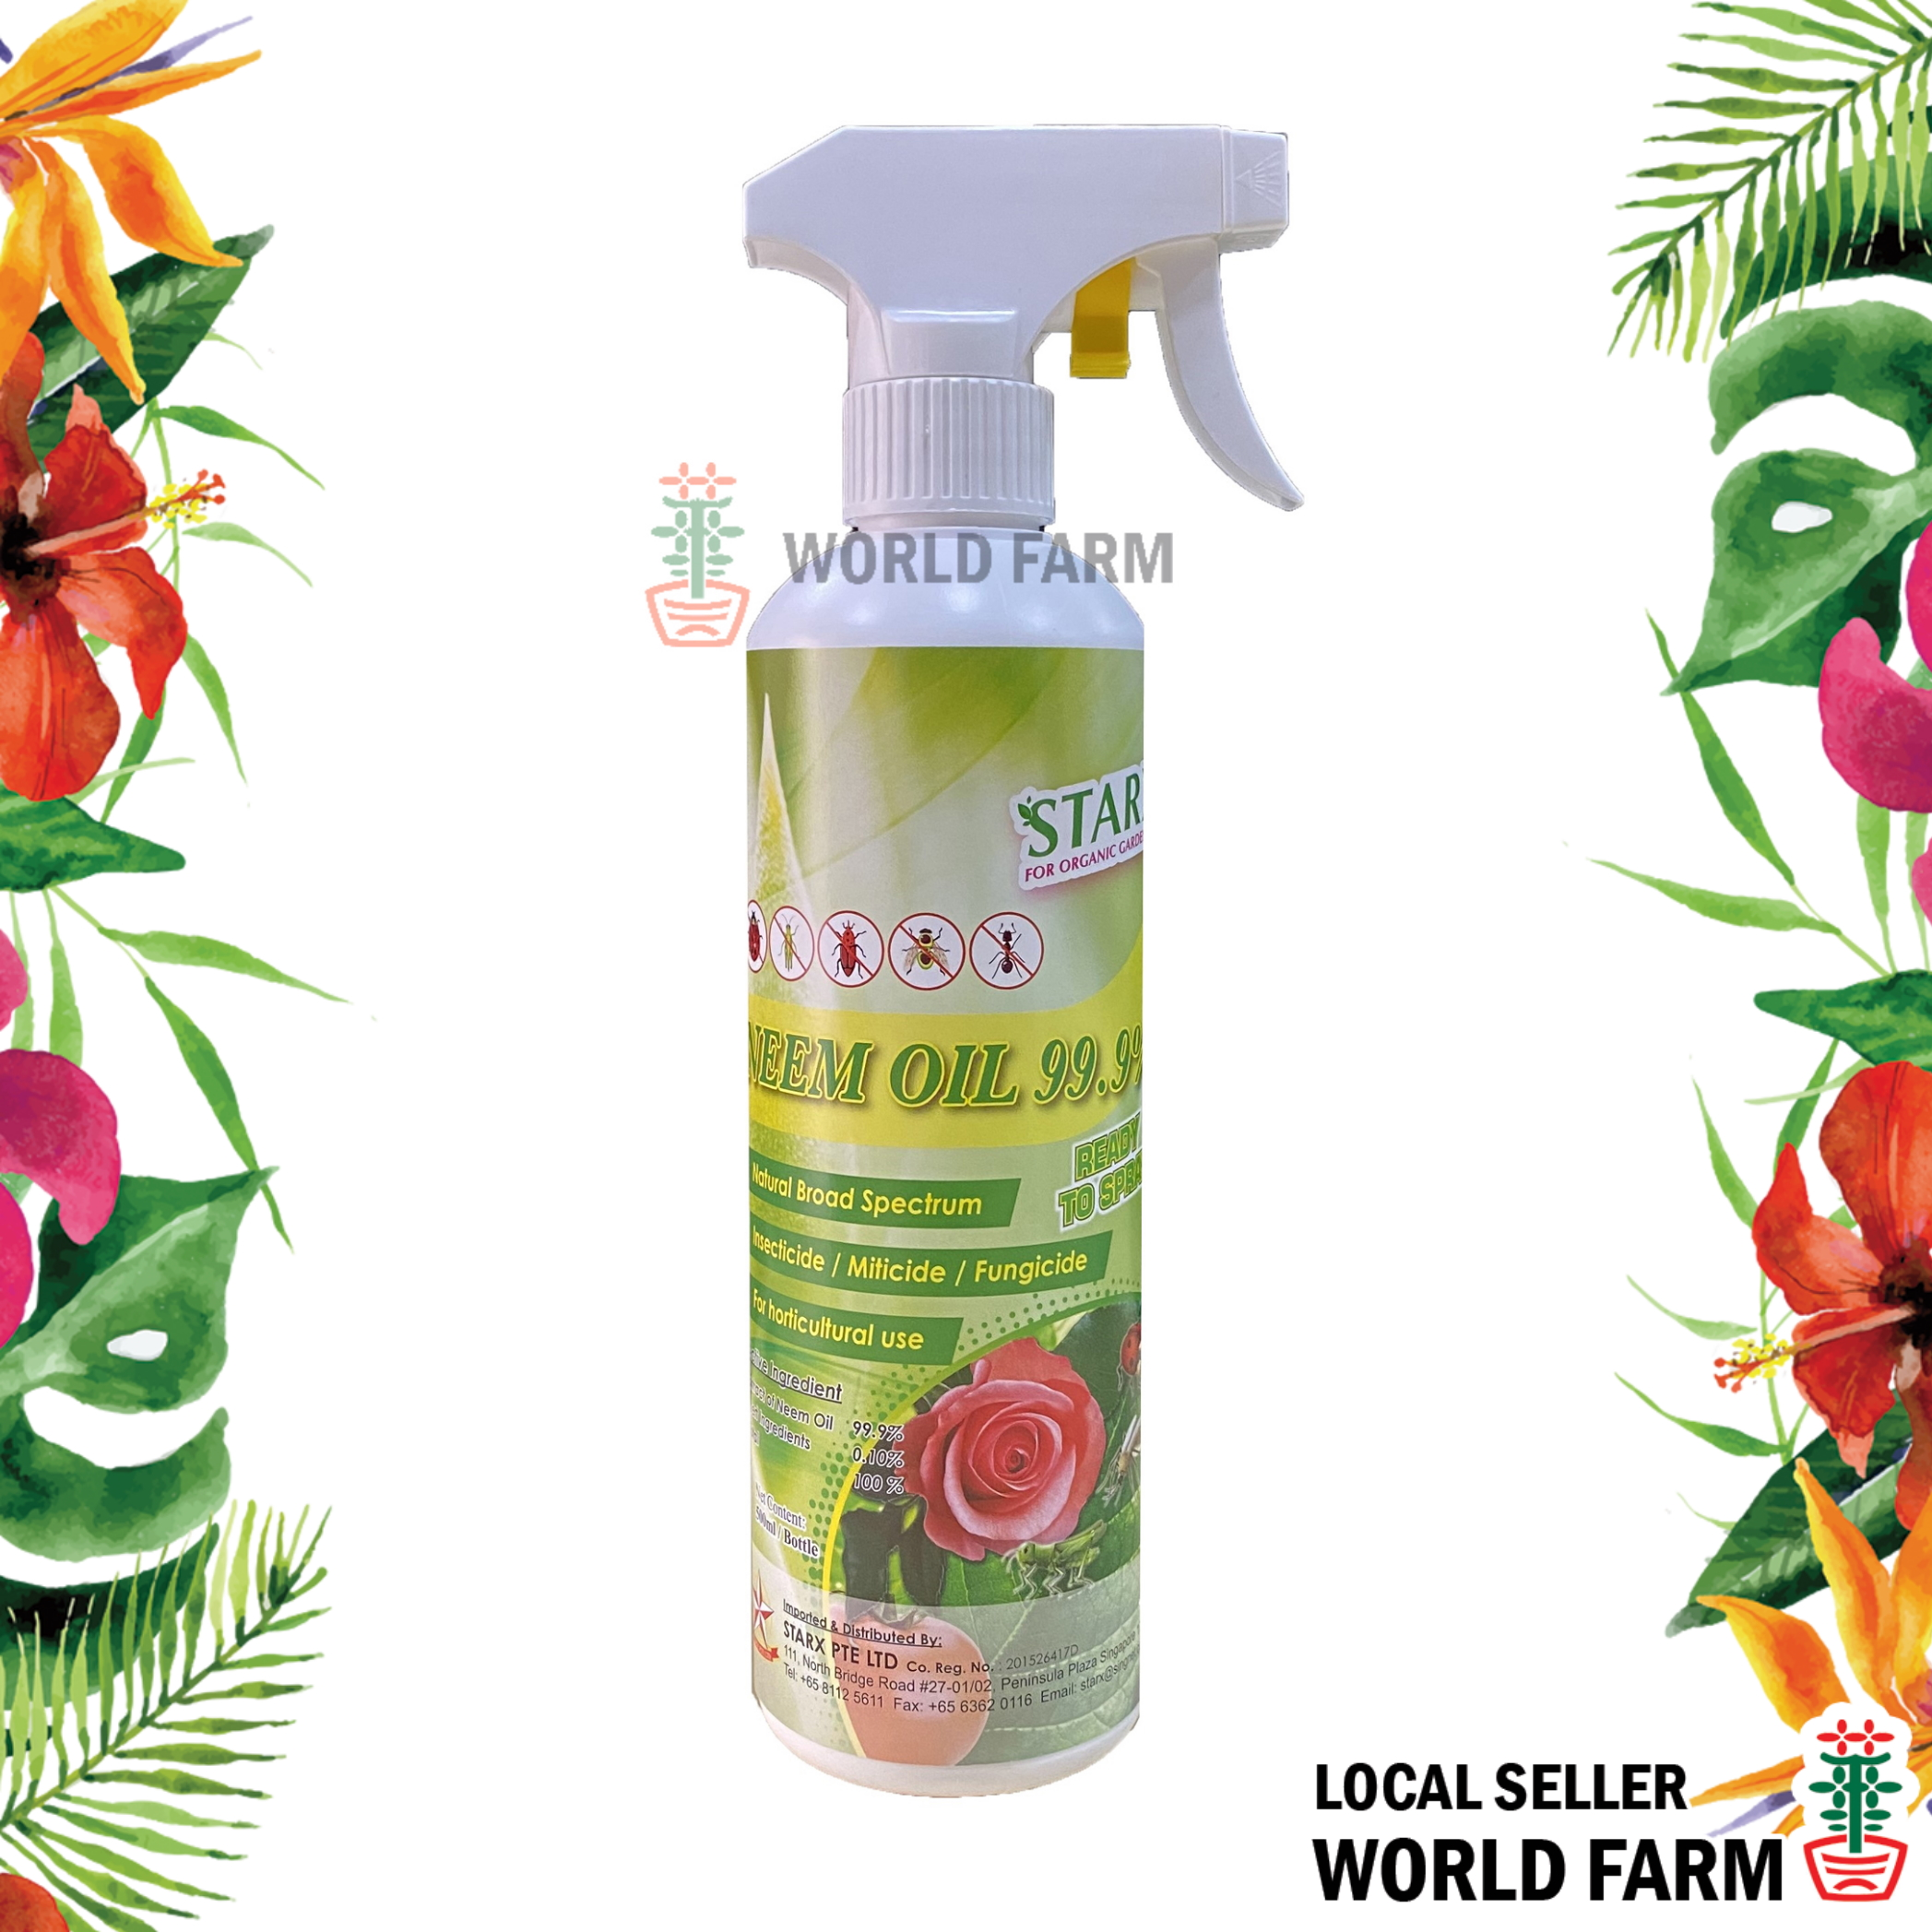 Neem Oil 99.9% Insecticide, Fungicide & Miticide Spray 500ml